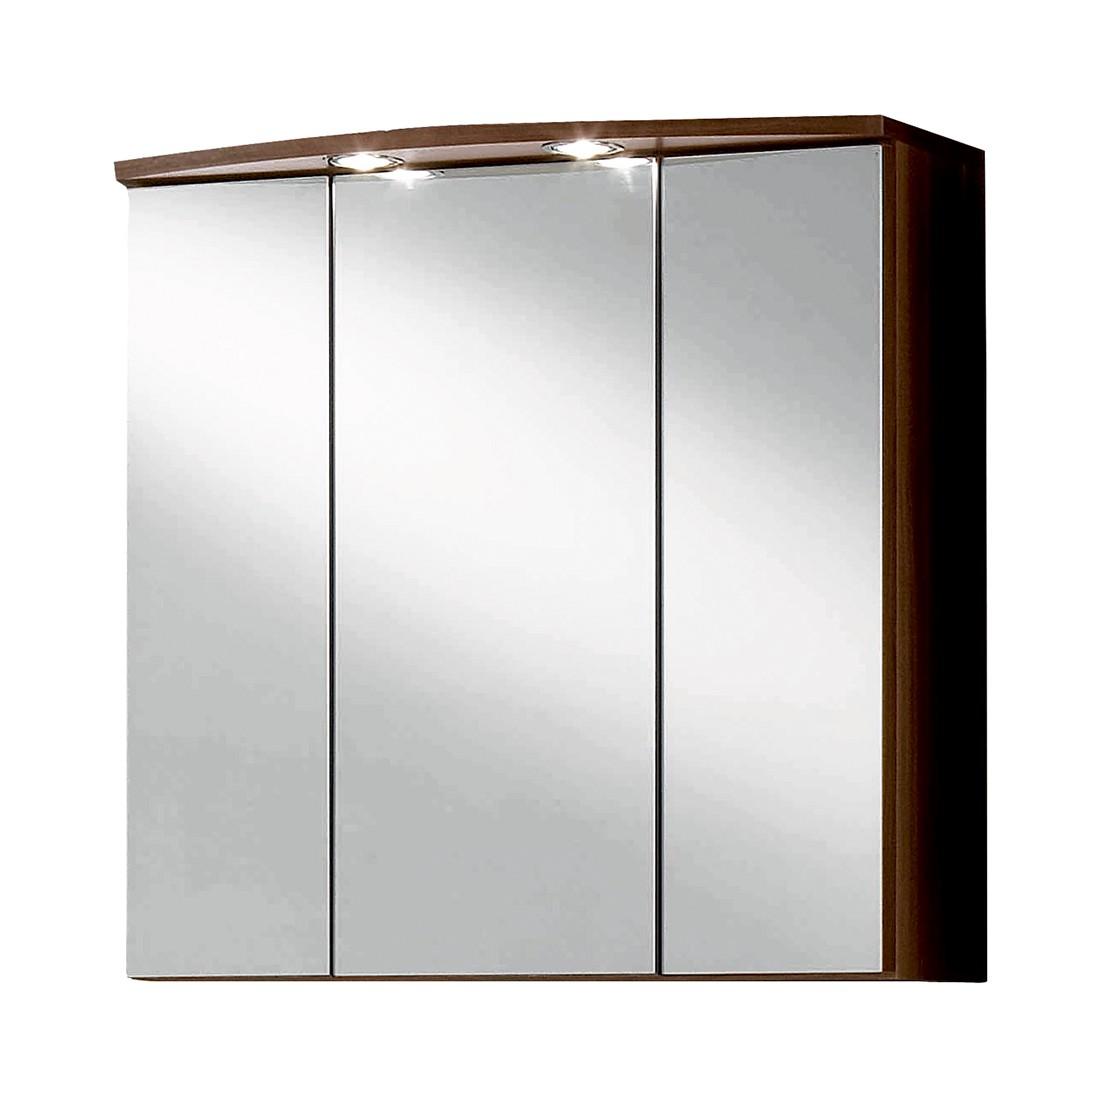 3d spiegelschrank well ness eiche dunkel. Black Bedroom Furniture Sets. Home Design Ideas